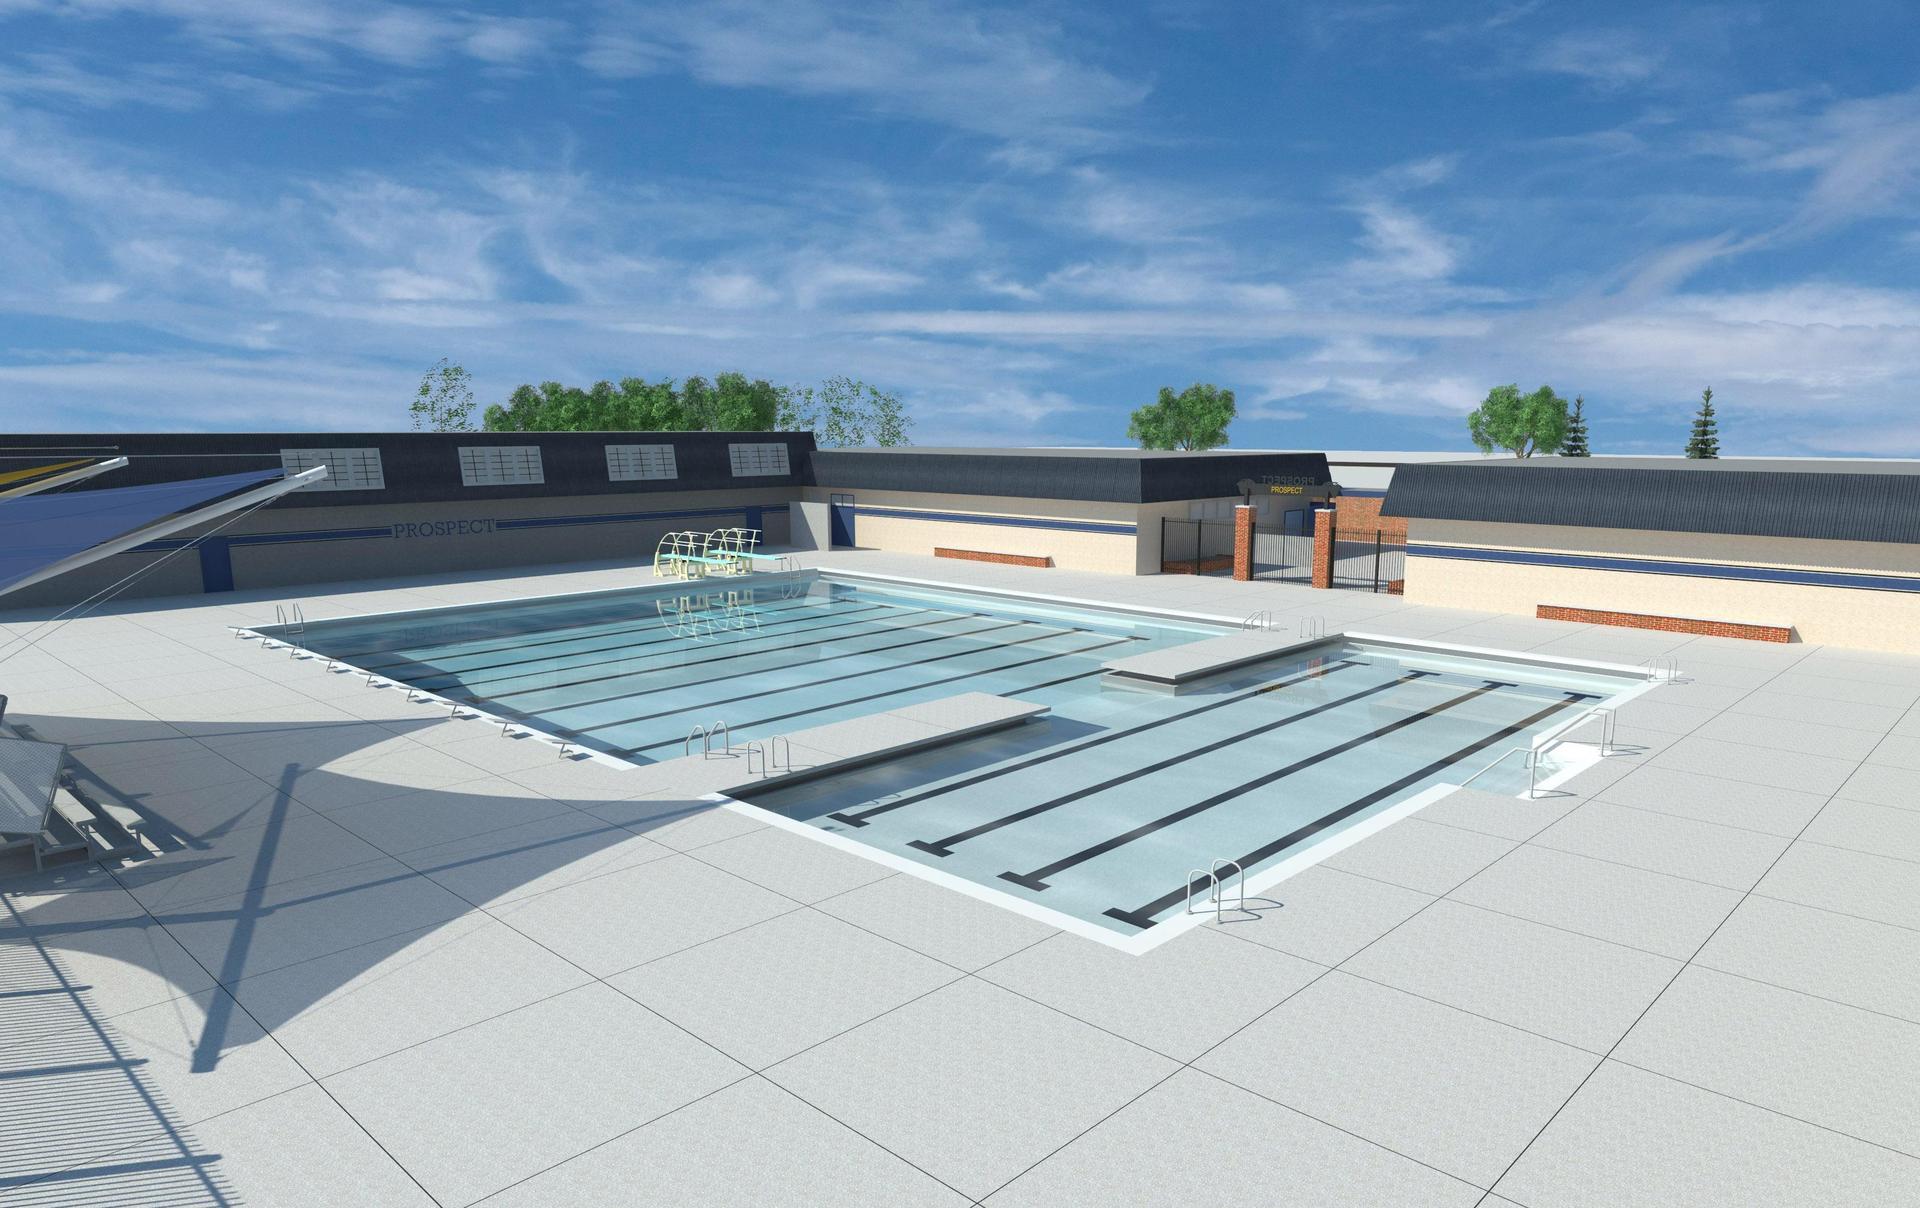 New pool design Summer 2020